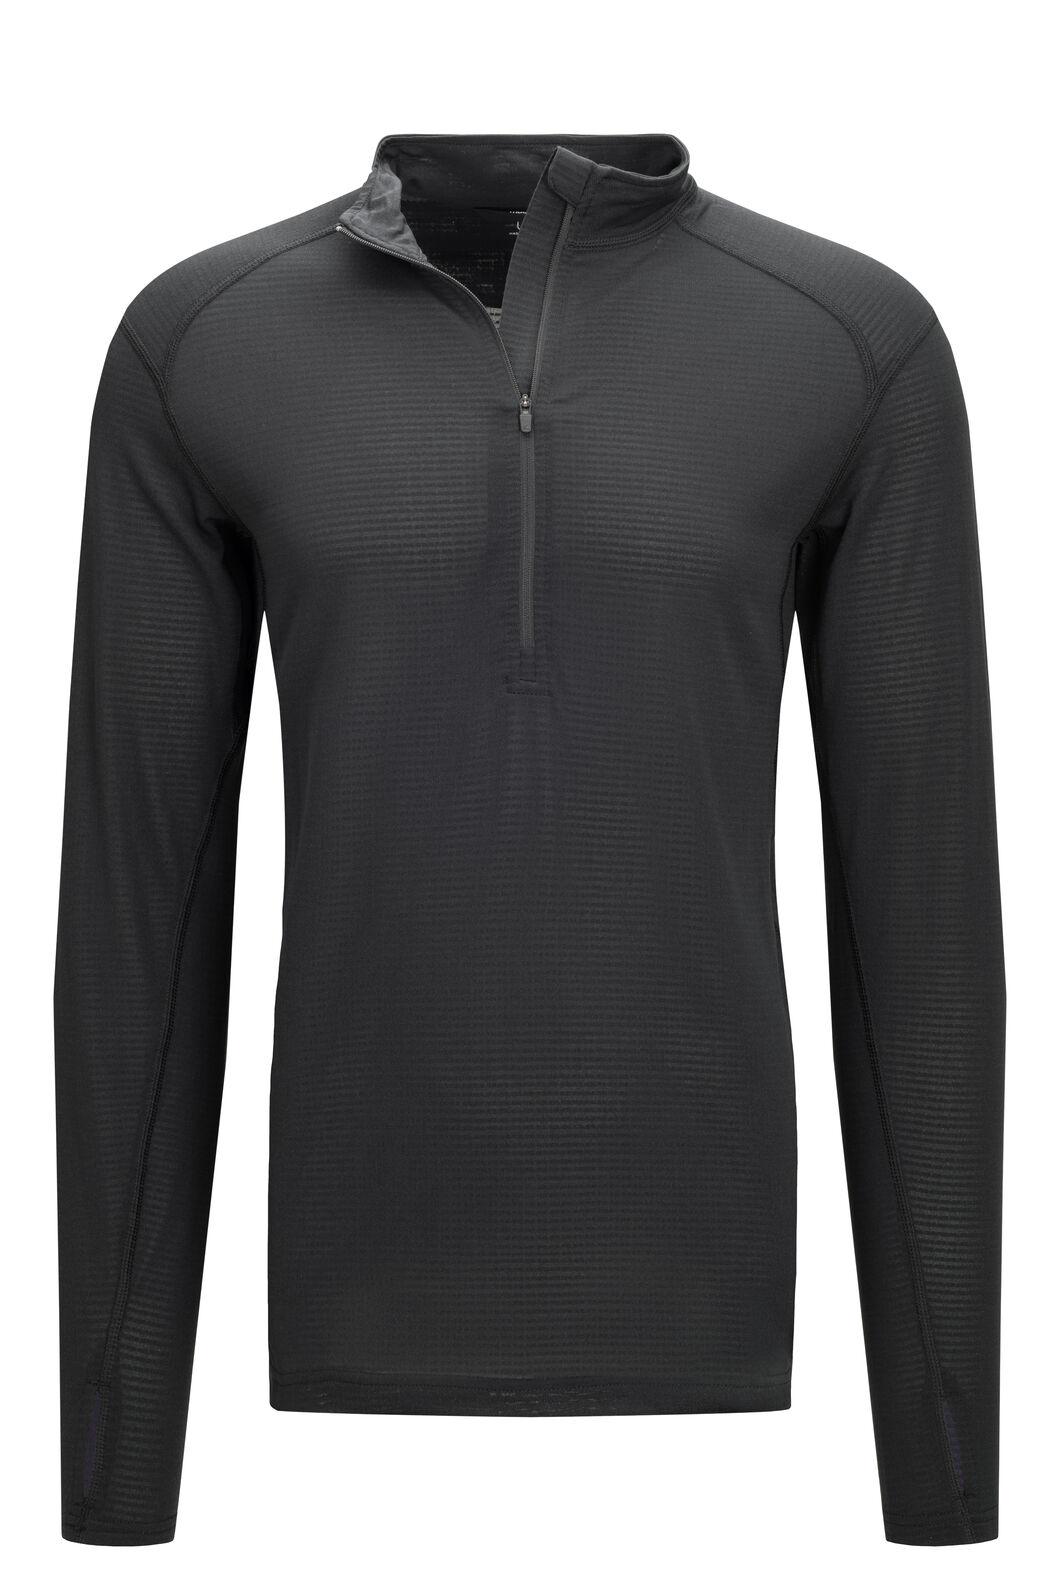 Macpac Men's Prothermal Polartec® Long Sleeve Top, Black, hi-res